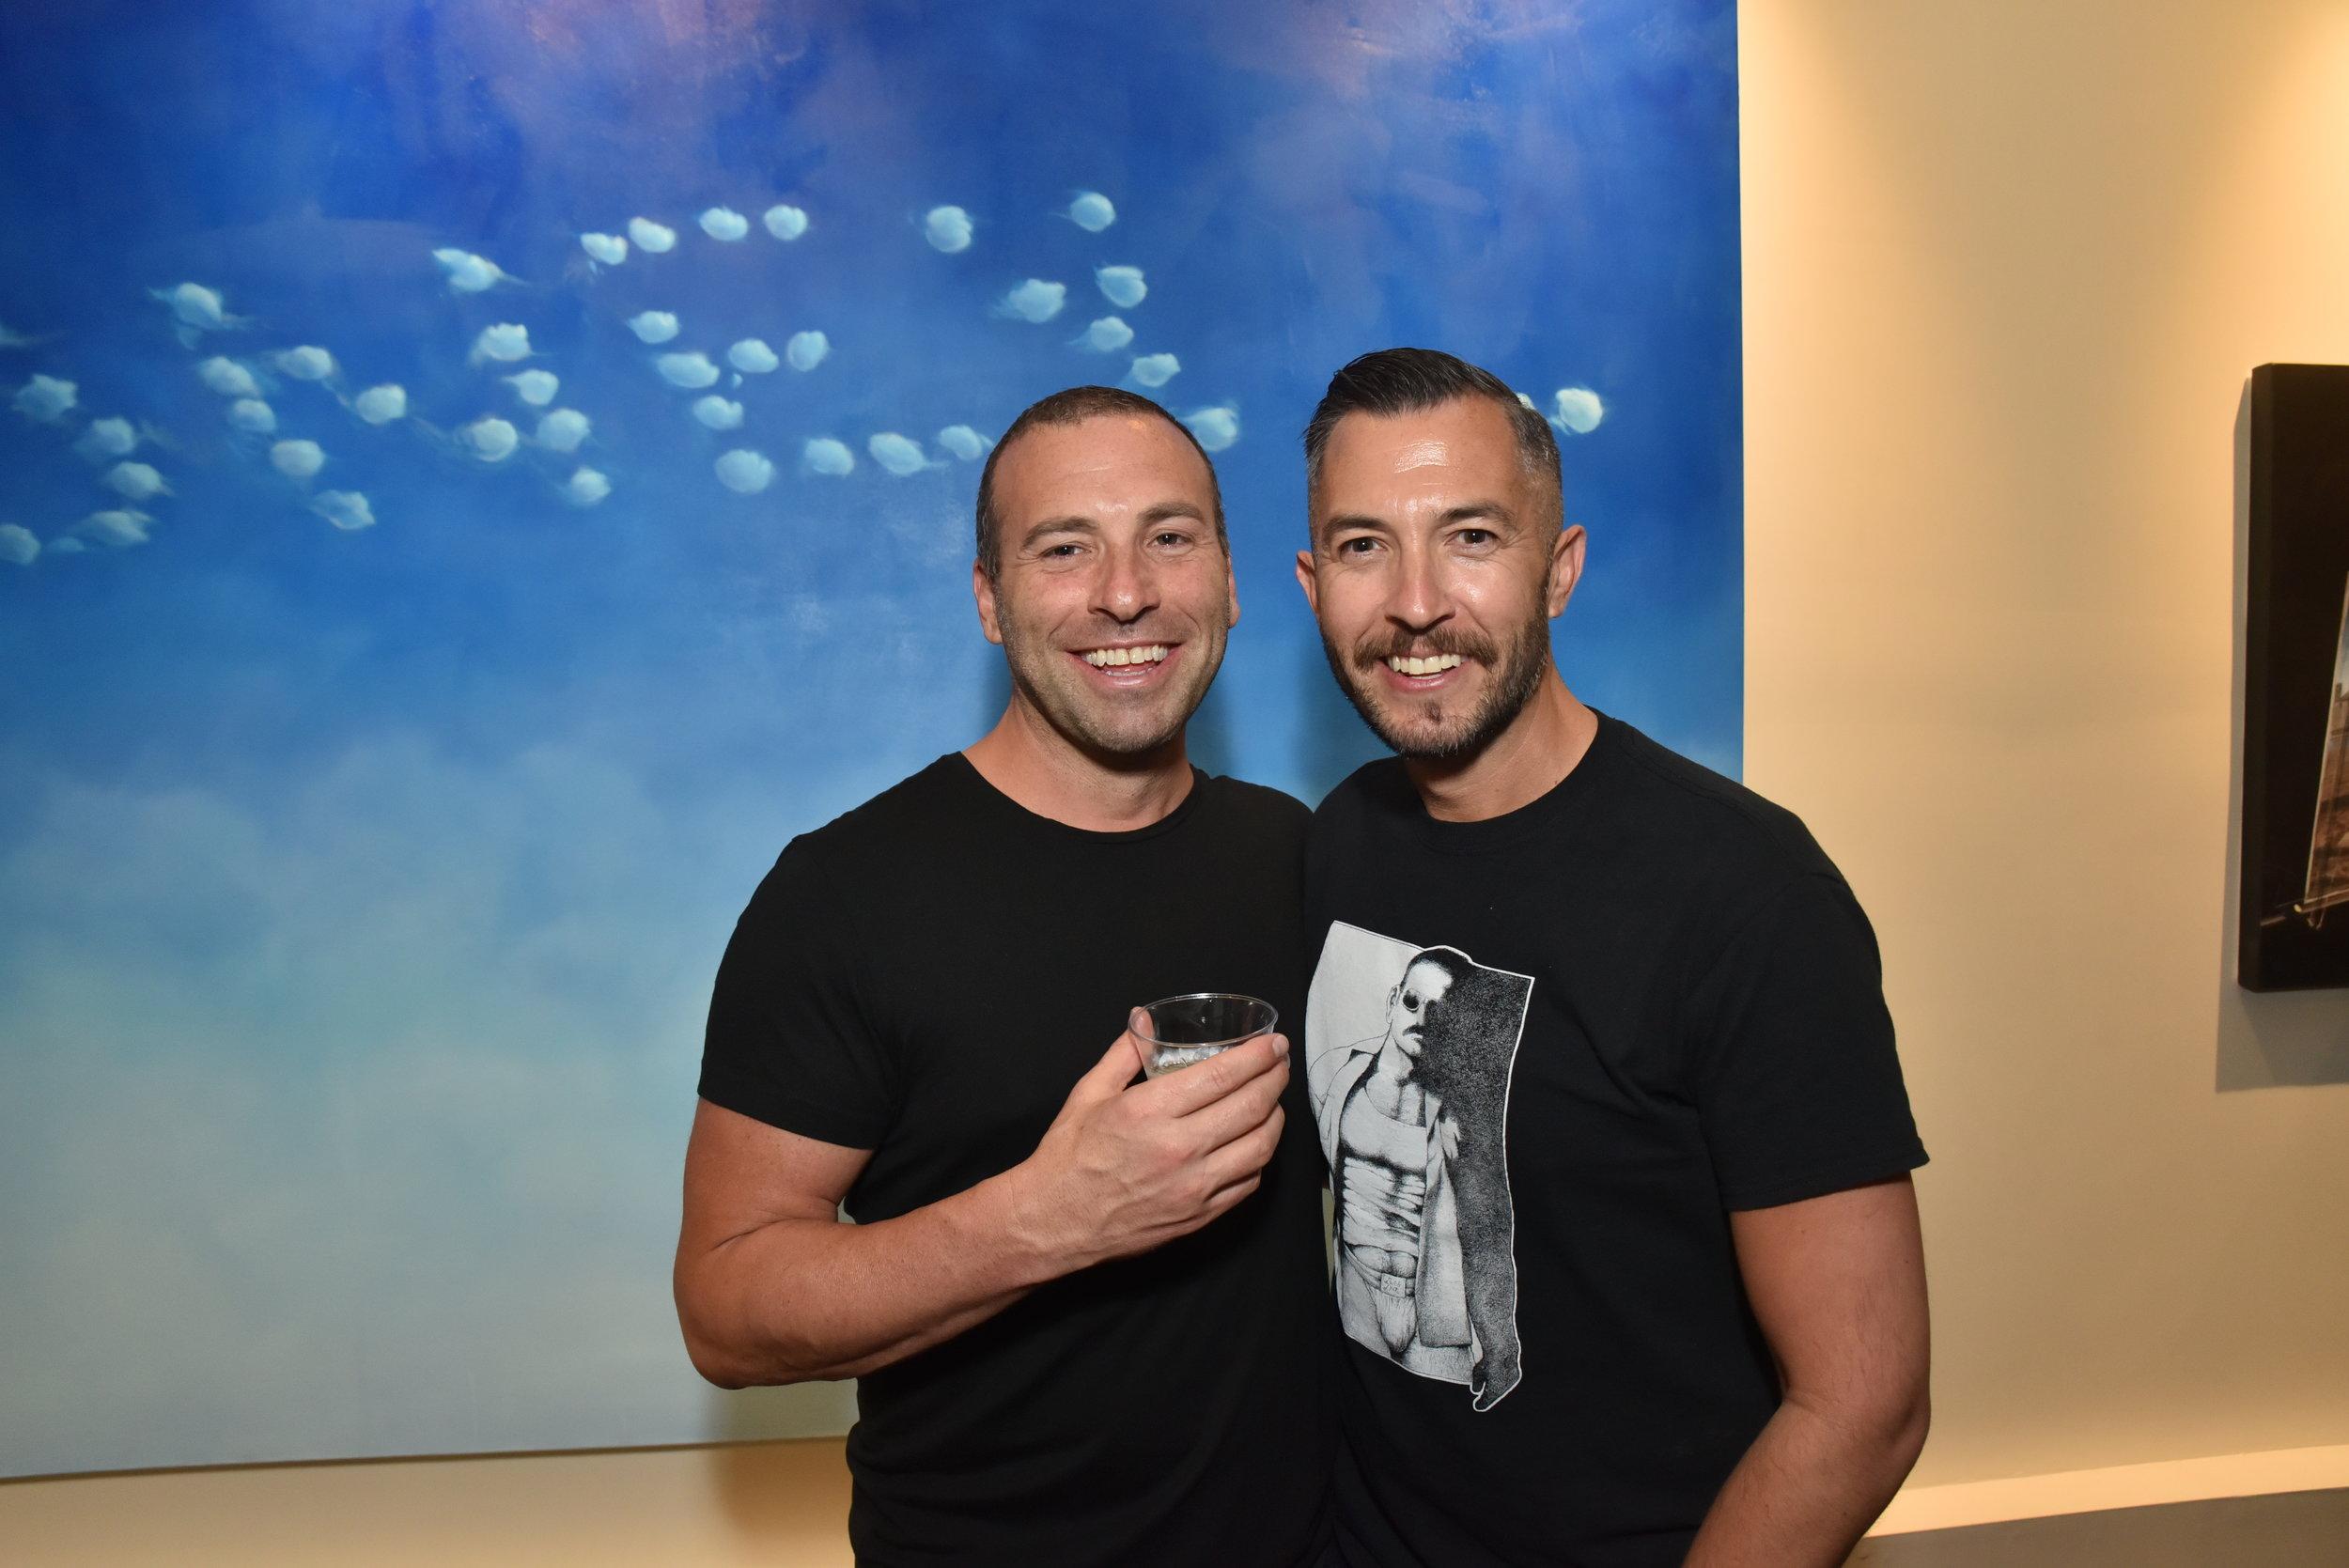 Curator: Steven Vasquez Lopez (right)